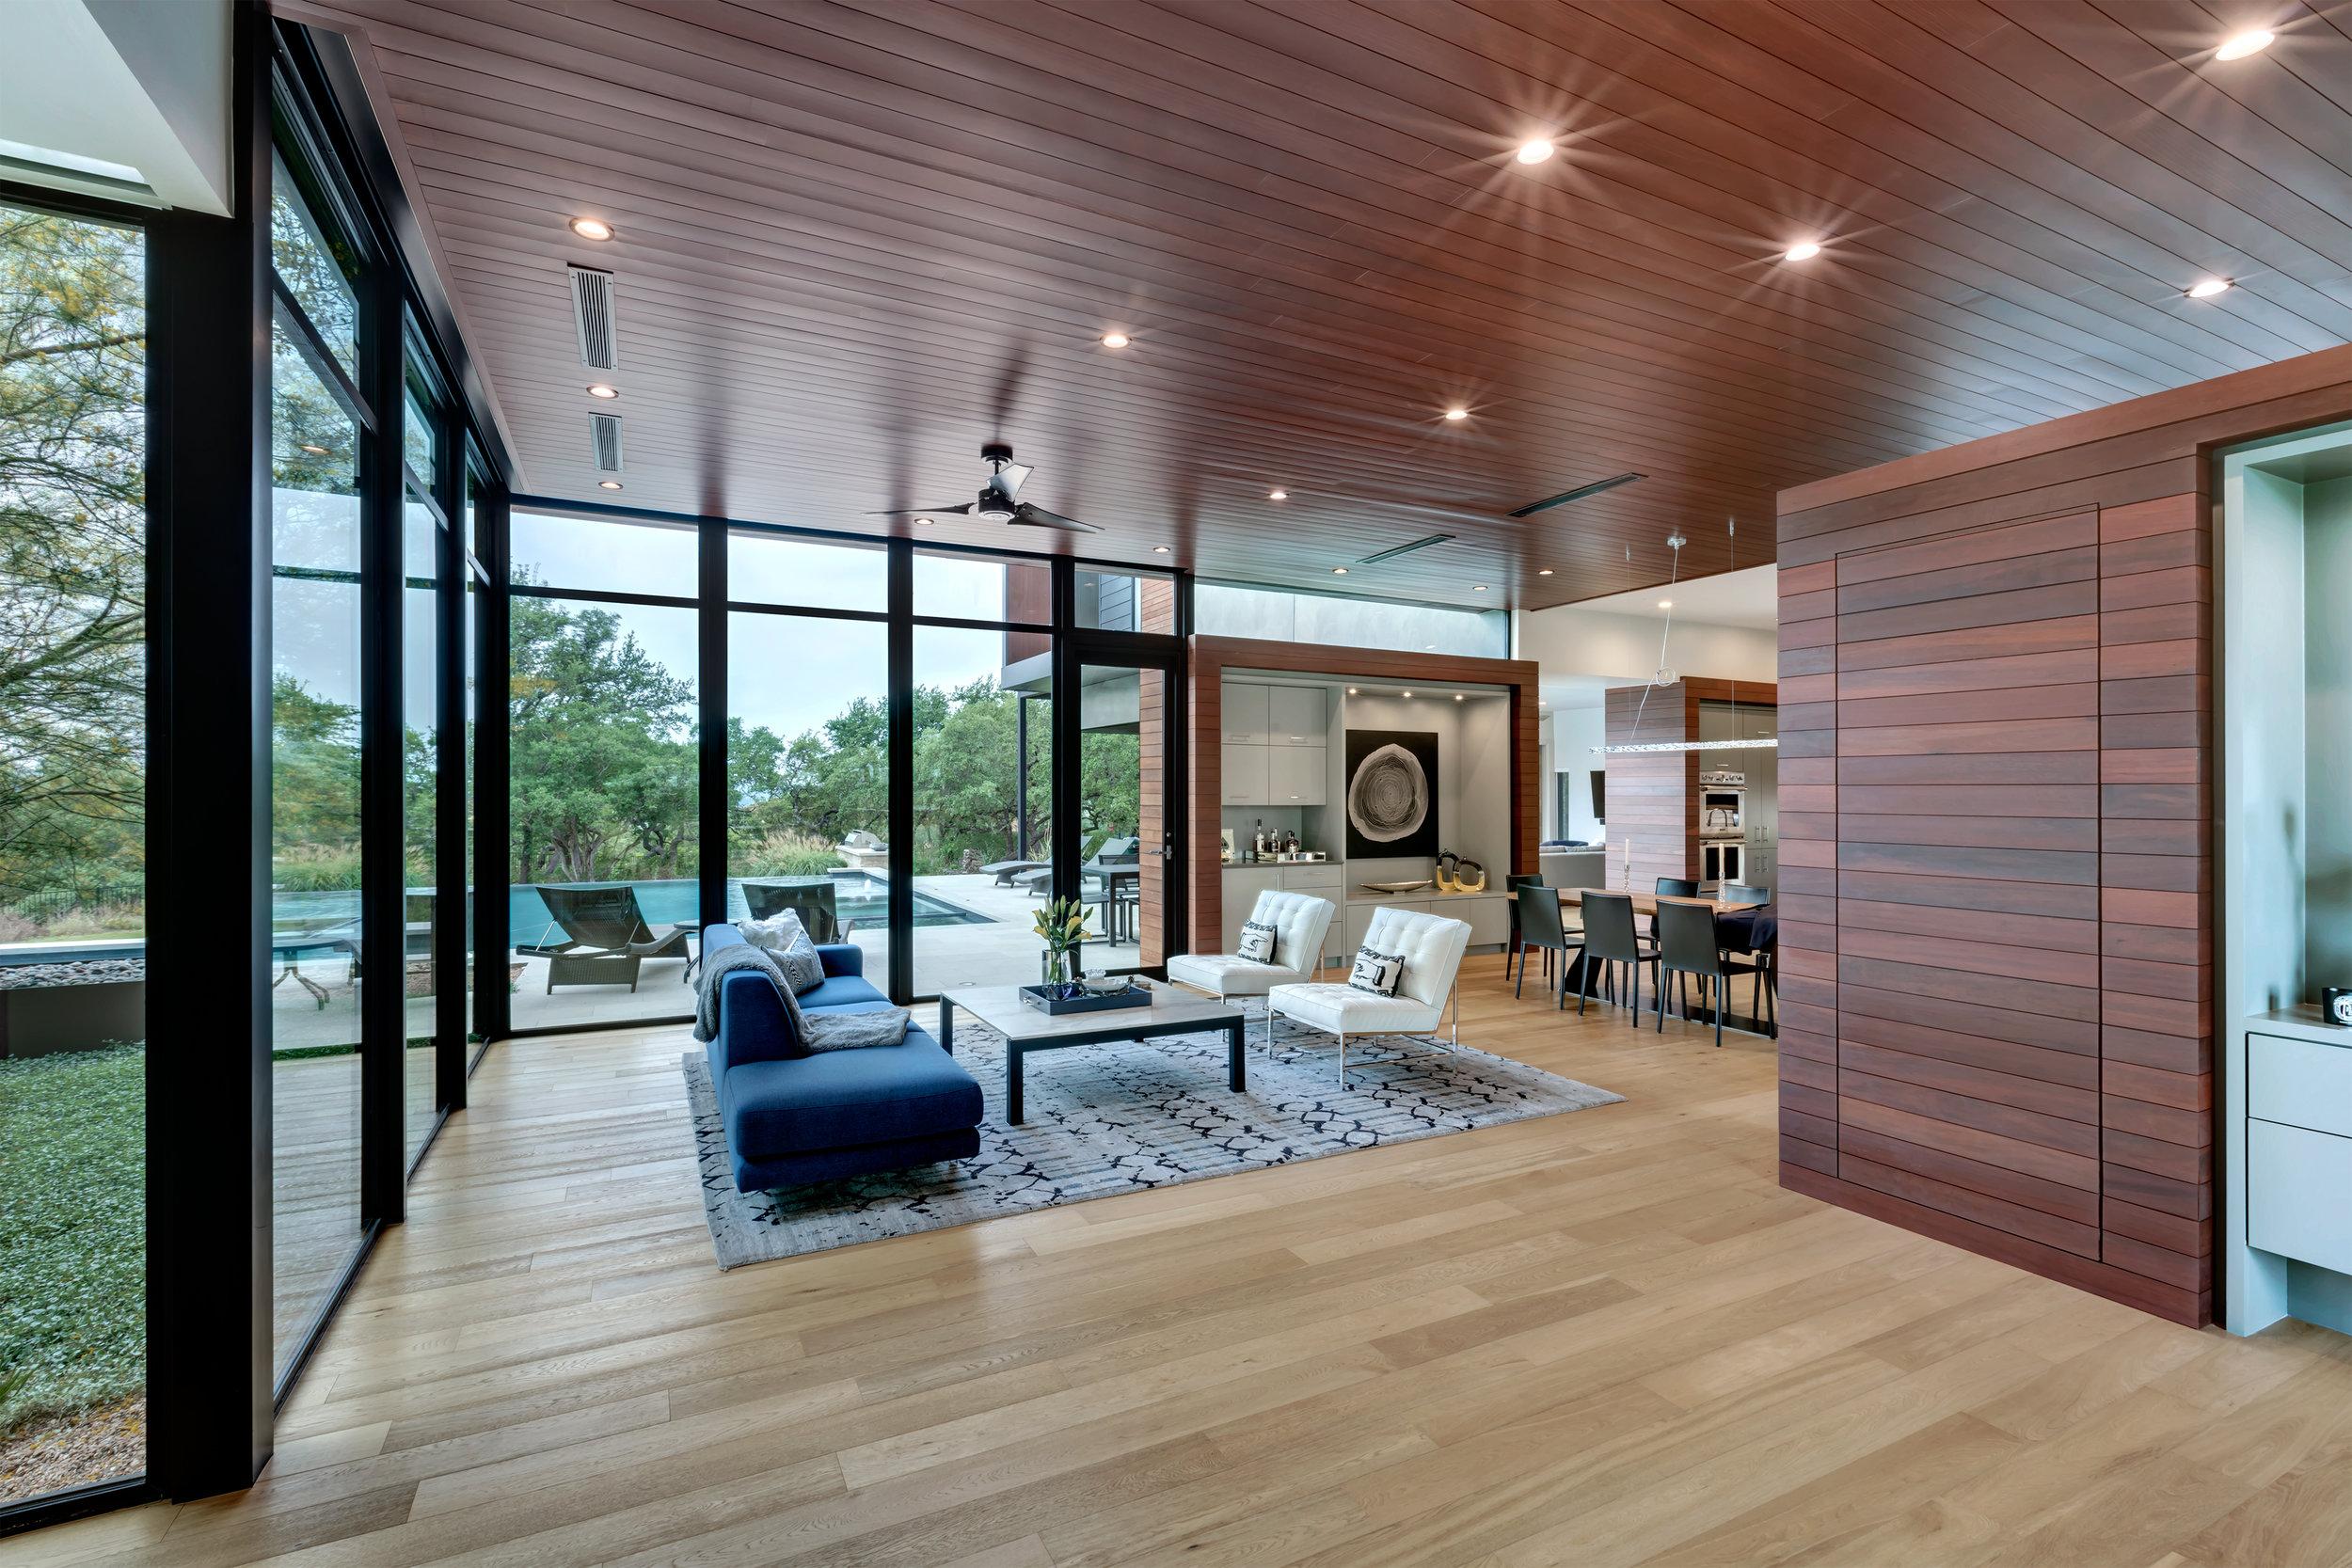 Matt Fajkus MF Architecture_Control-Shift House_Interior Photo 1 by Charles Davis Smith.jpg